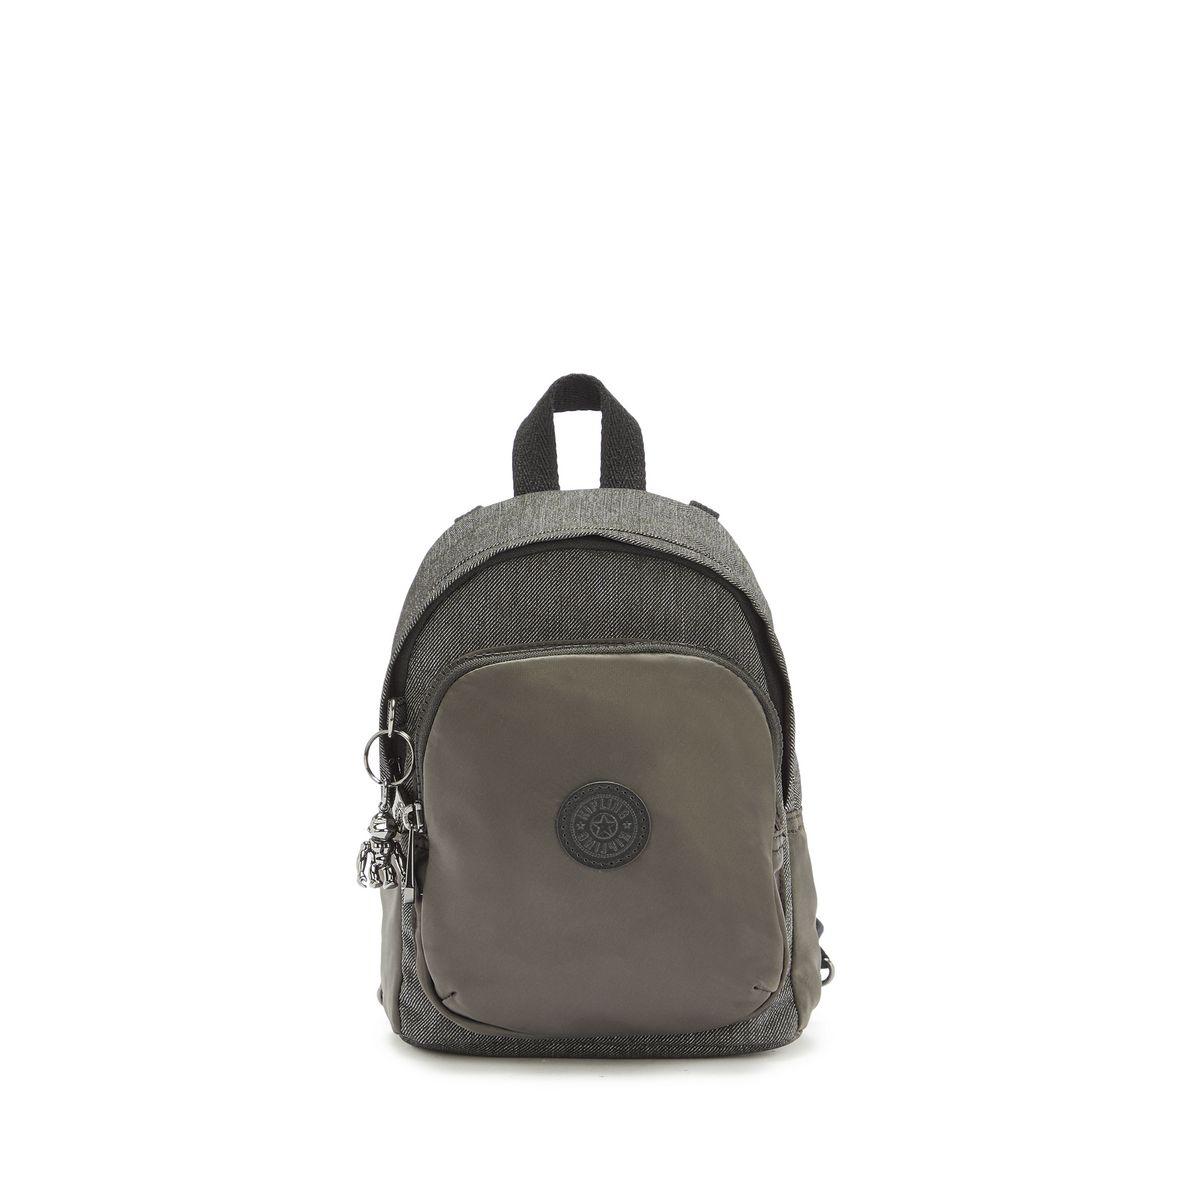 Kipling Delia Compact Small Backpack Black Pep Block